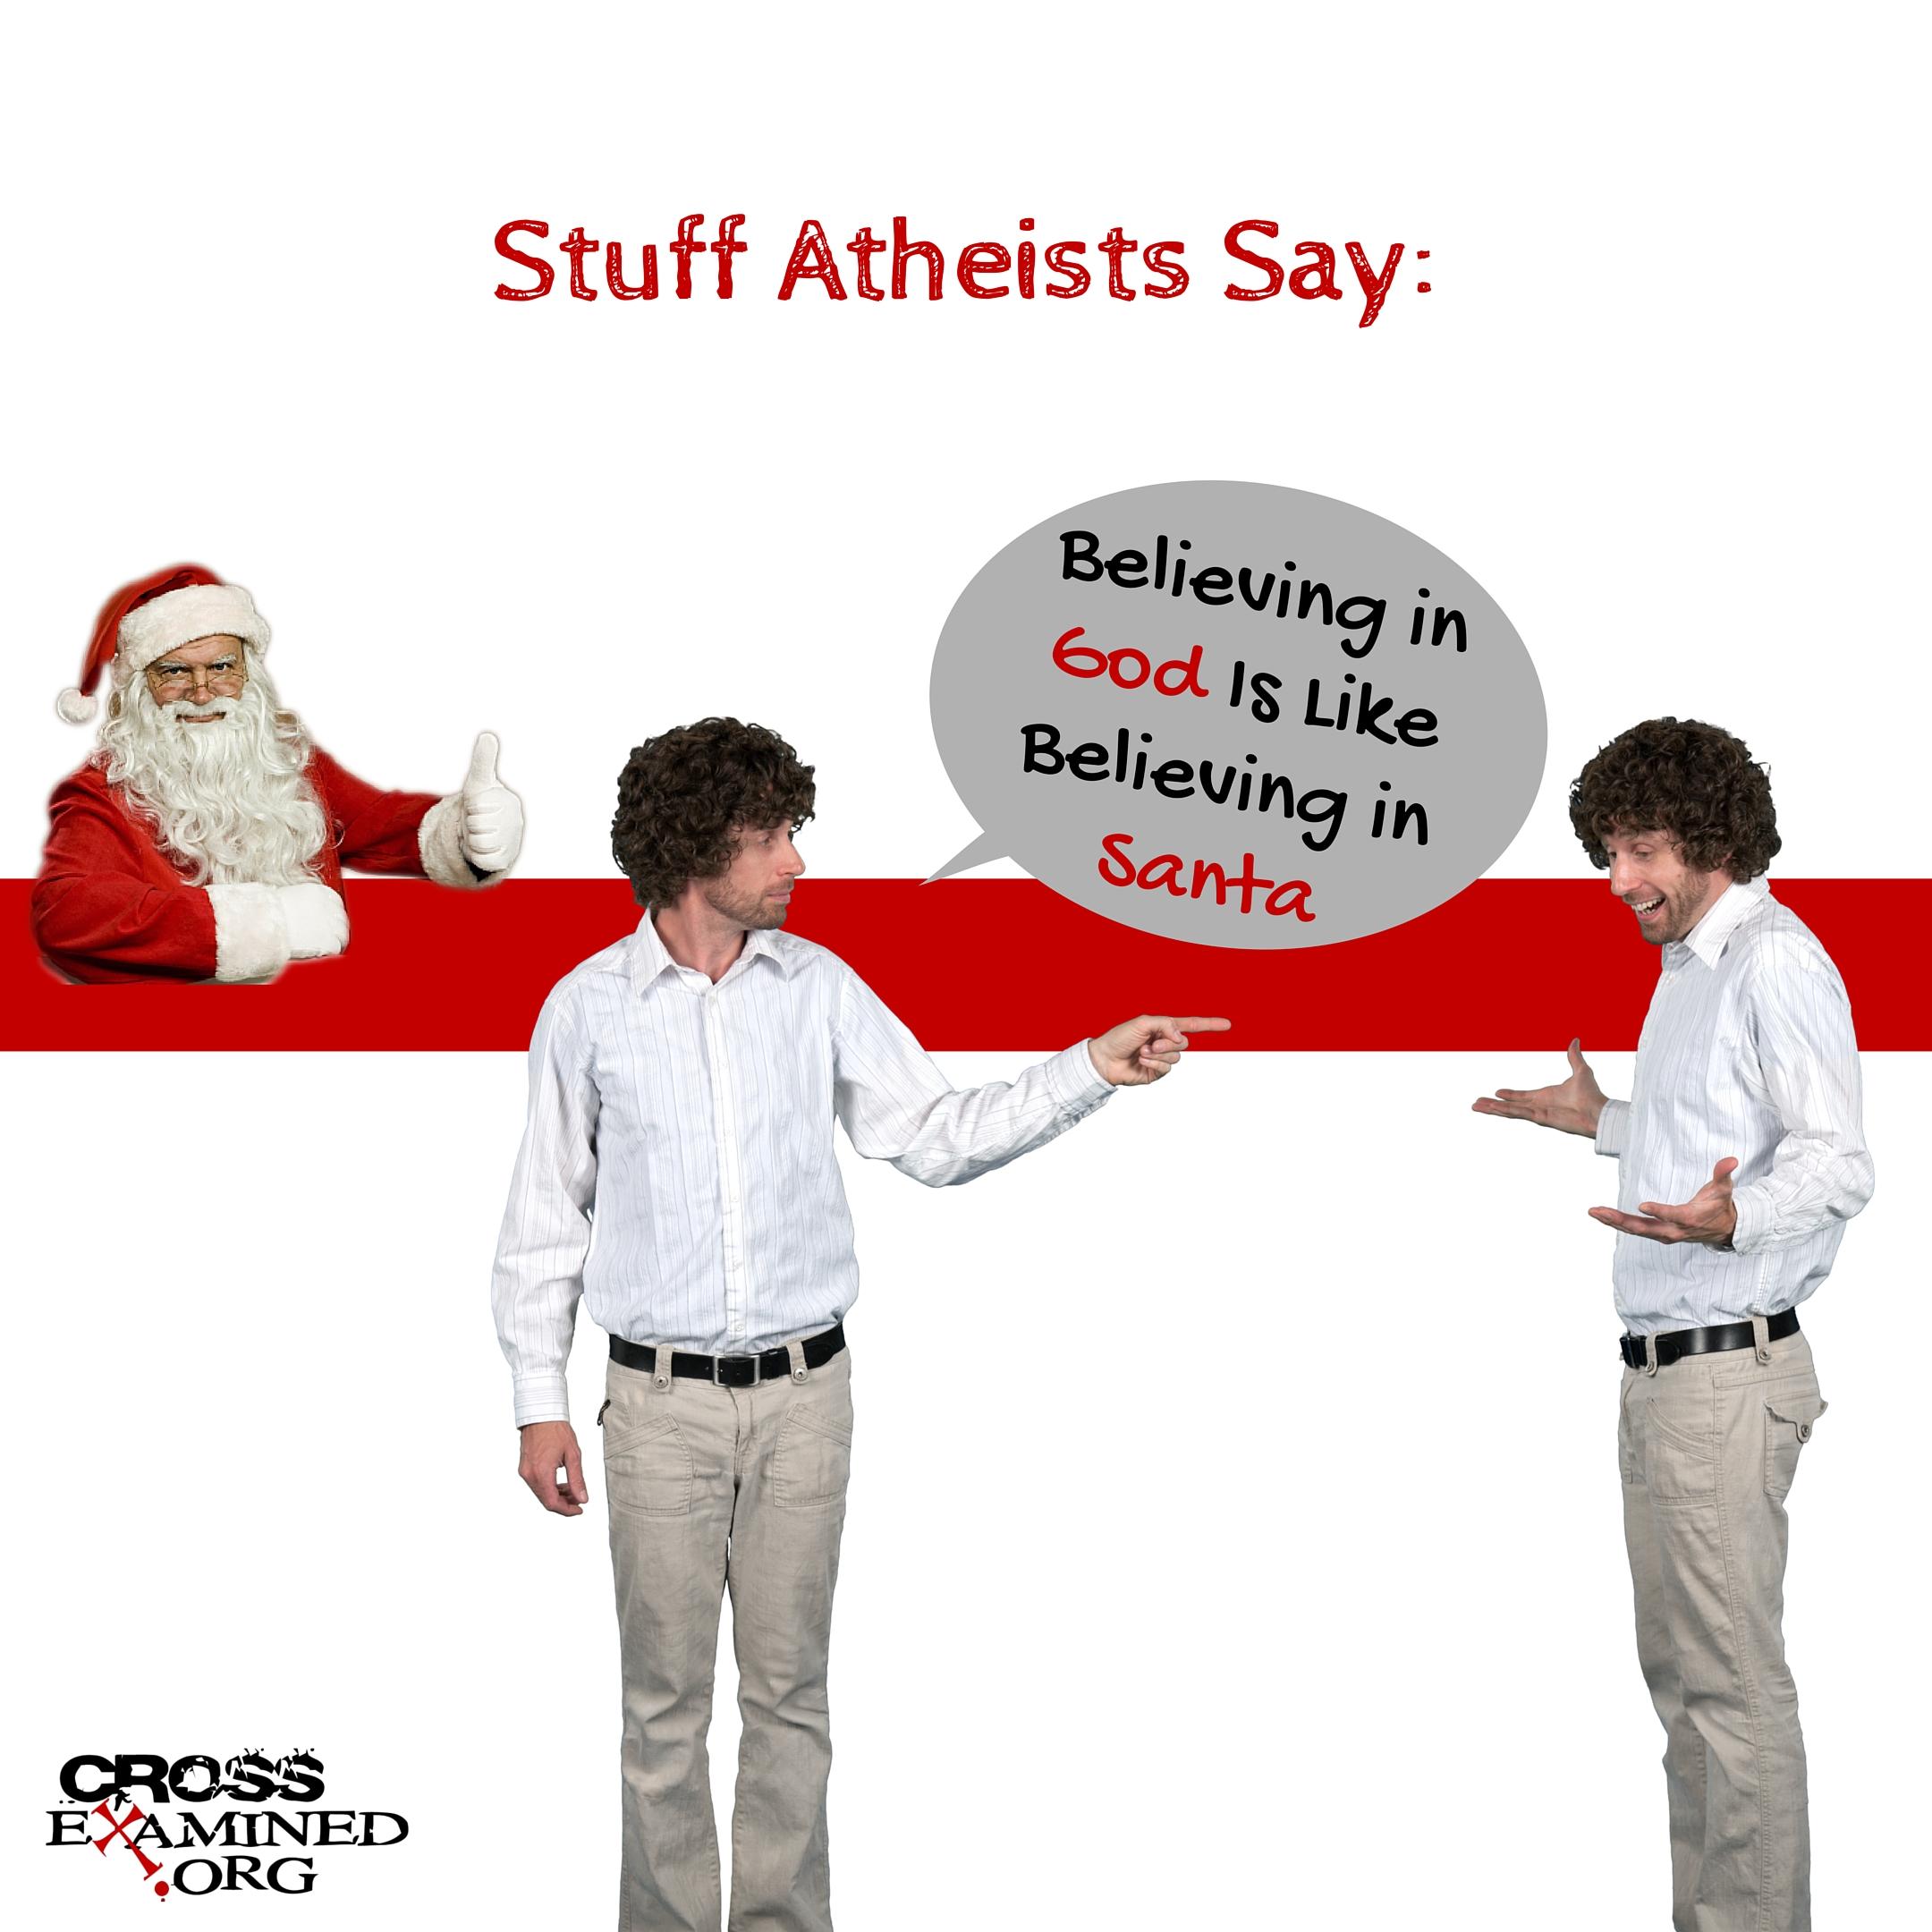 Stuff Atheists Say: Believing in God Is Like Believing in Santa